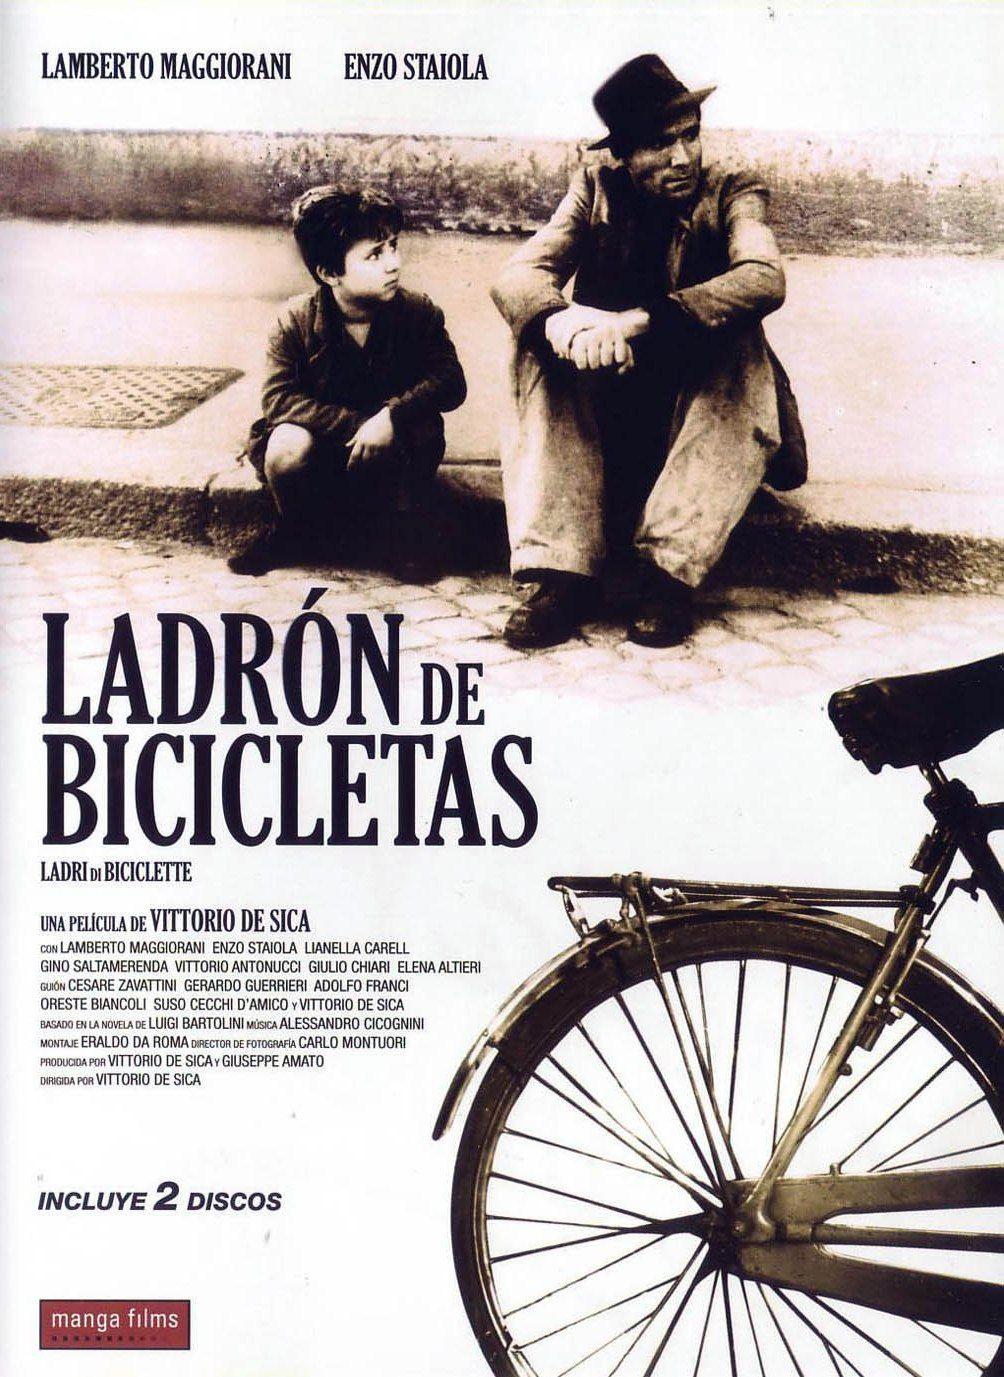 Ladron De Bicicletas Vittorio De Sica Carteles De Cine Afiche